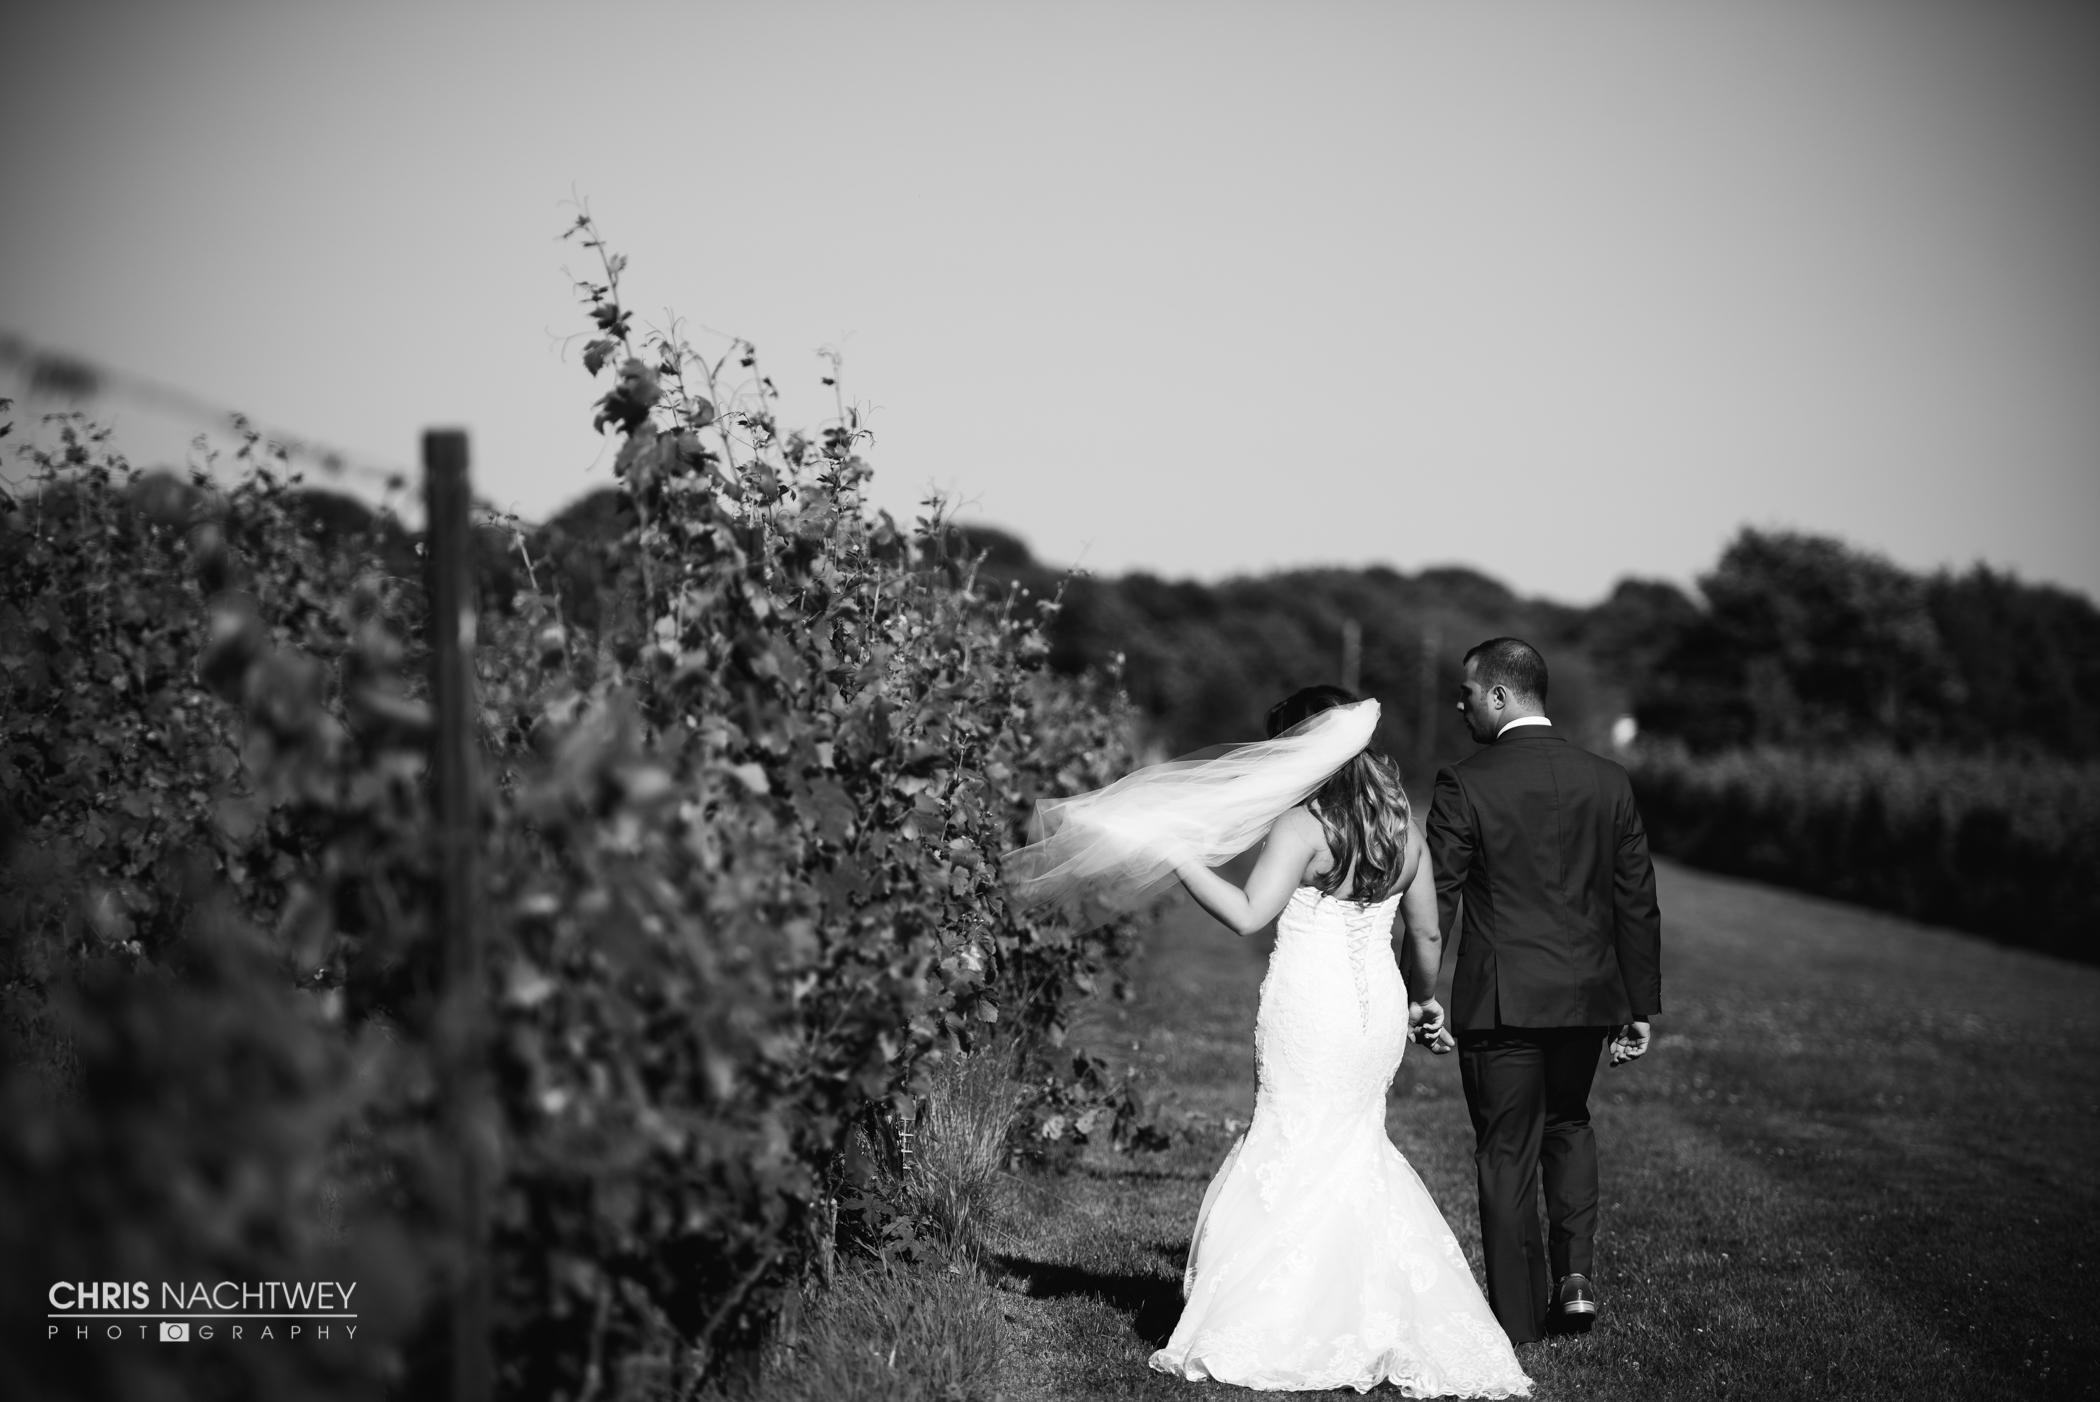 saltwater-farm-vineyard-wedding-photos-lindsay-gabe-chris-nachtwey-photography-2017-41.jpg